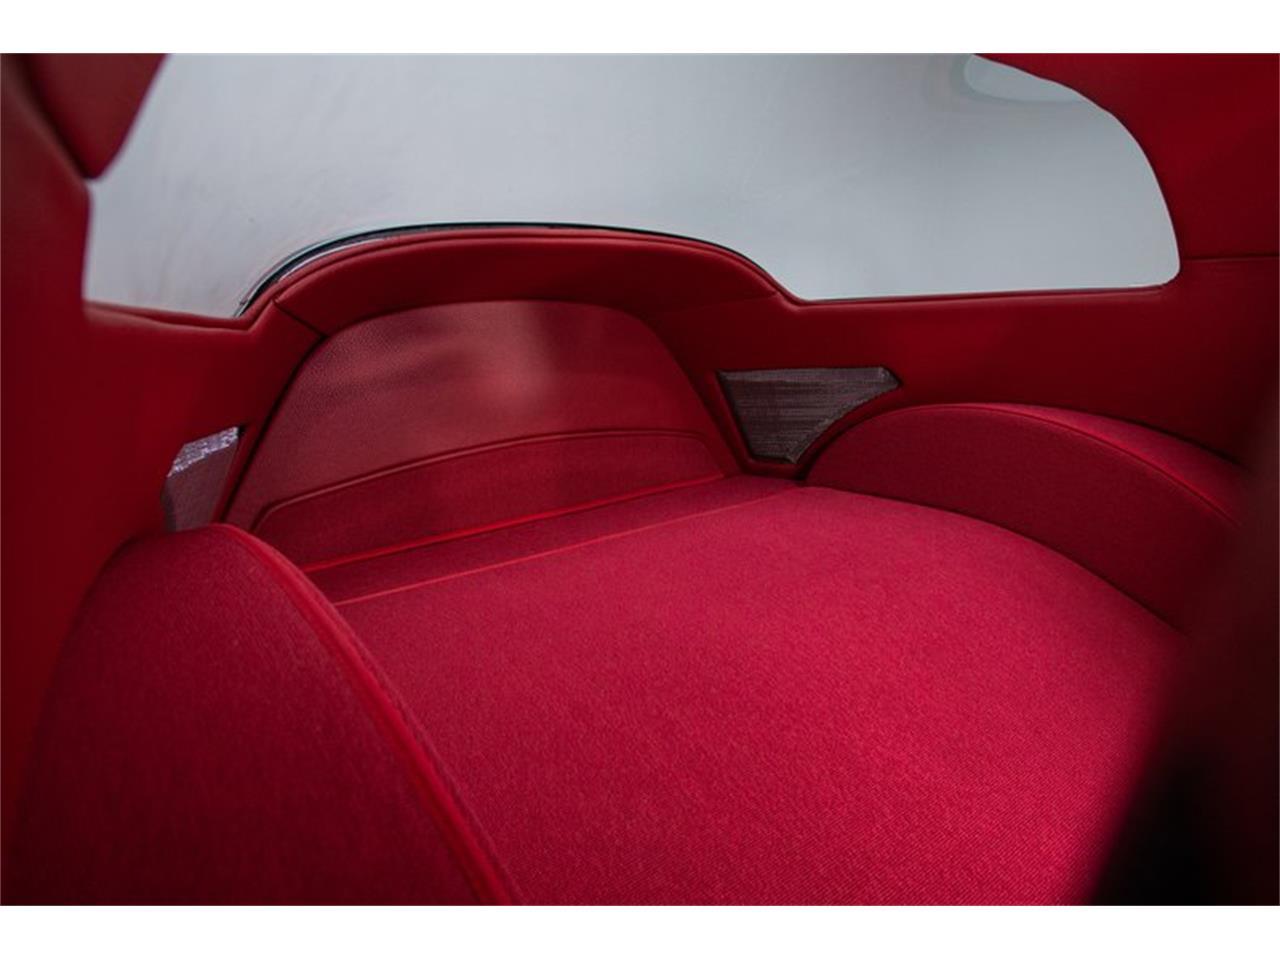 Large Picture of Classic 1967 Corvette located in Charlotte North Carolina - $189,900.00 - Q4OM